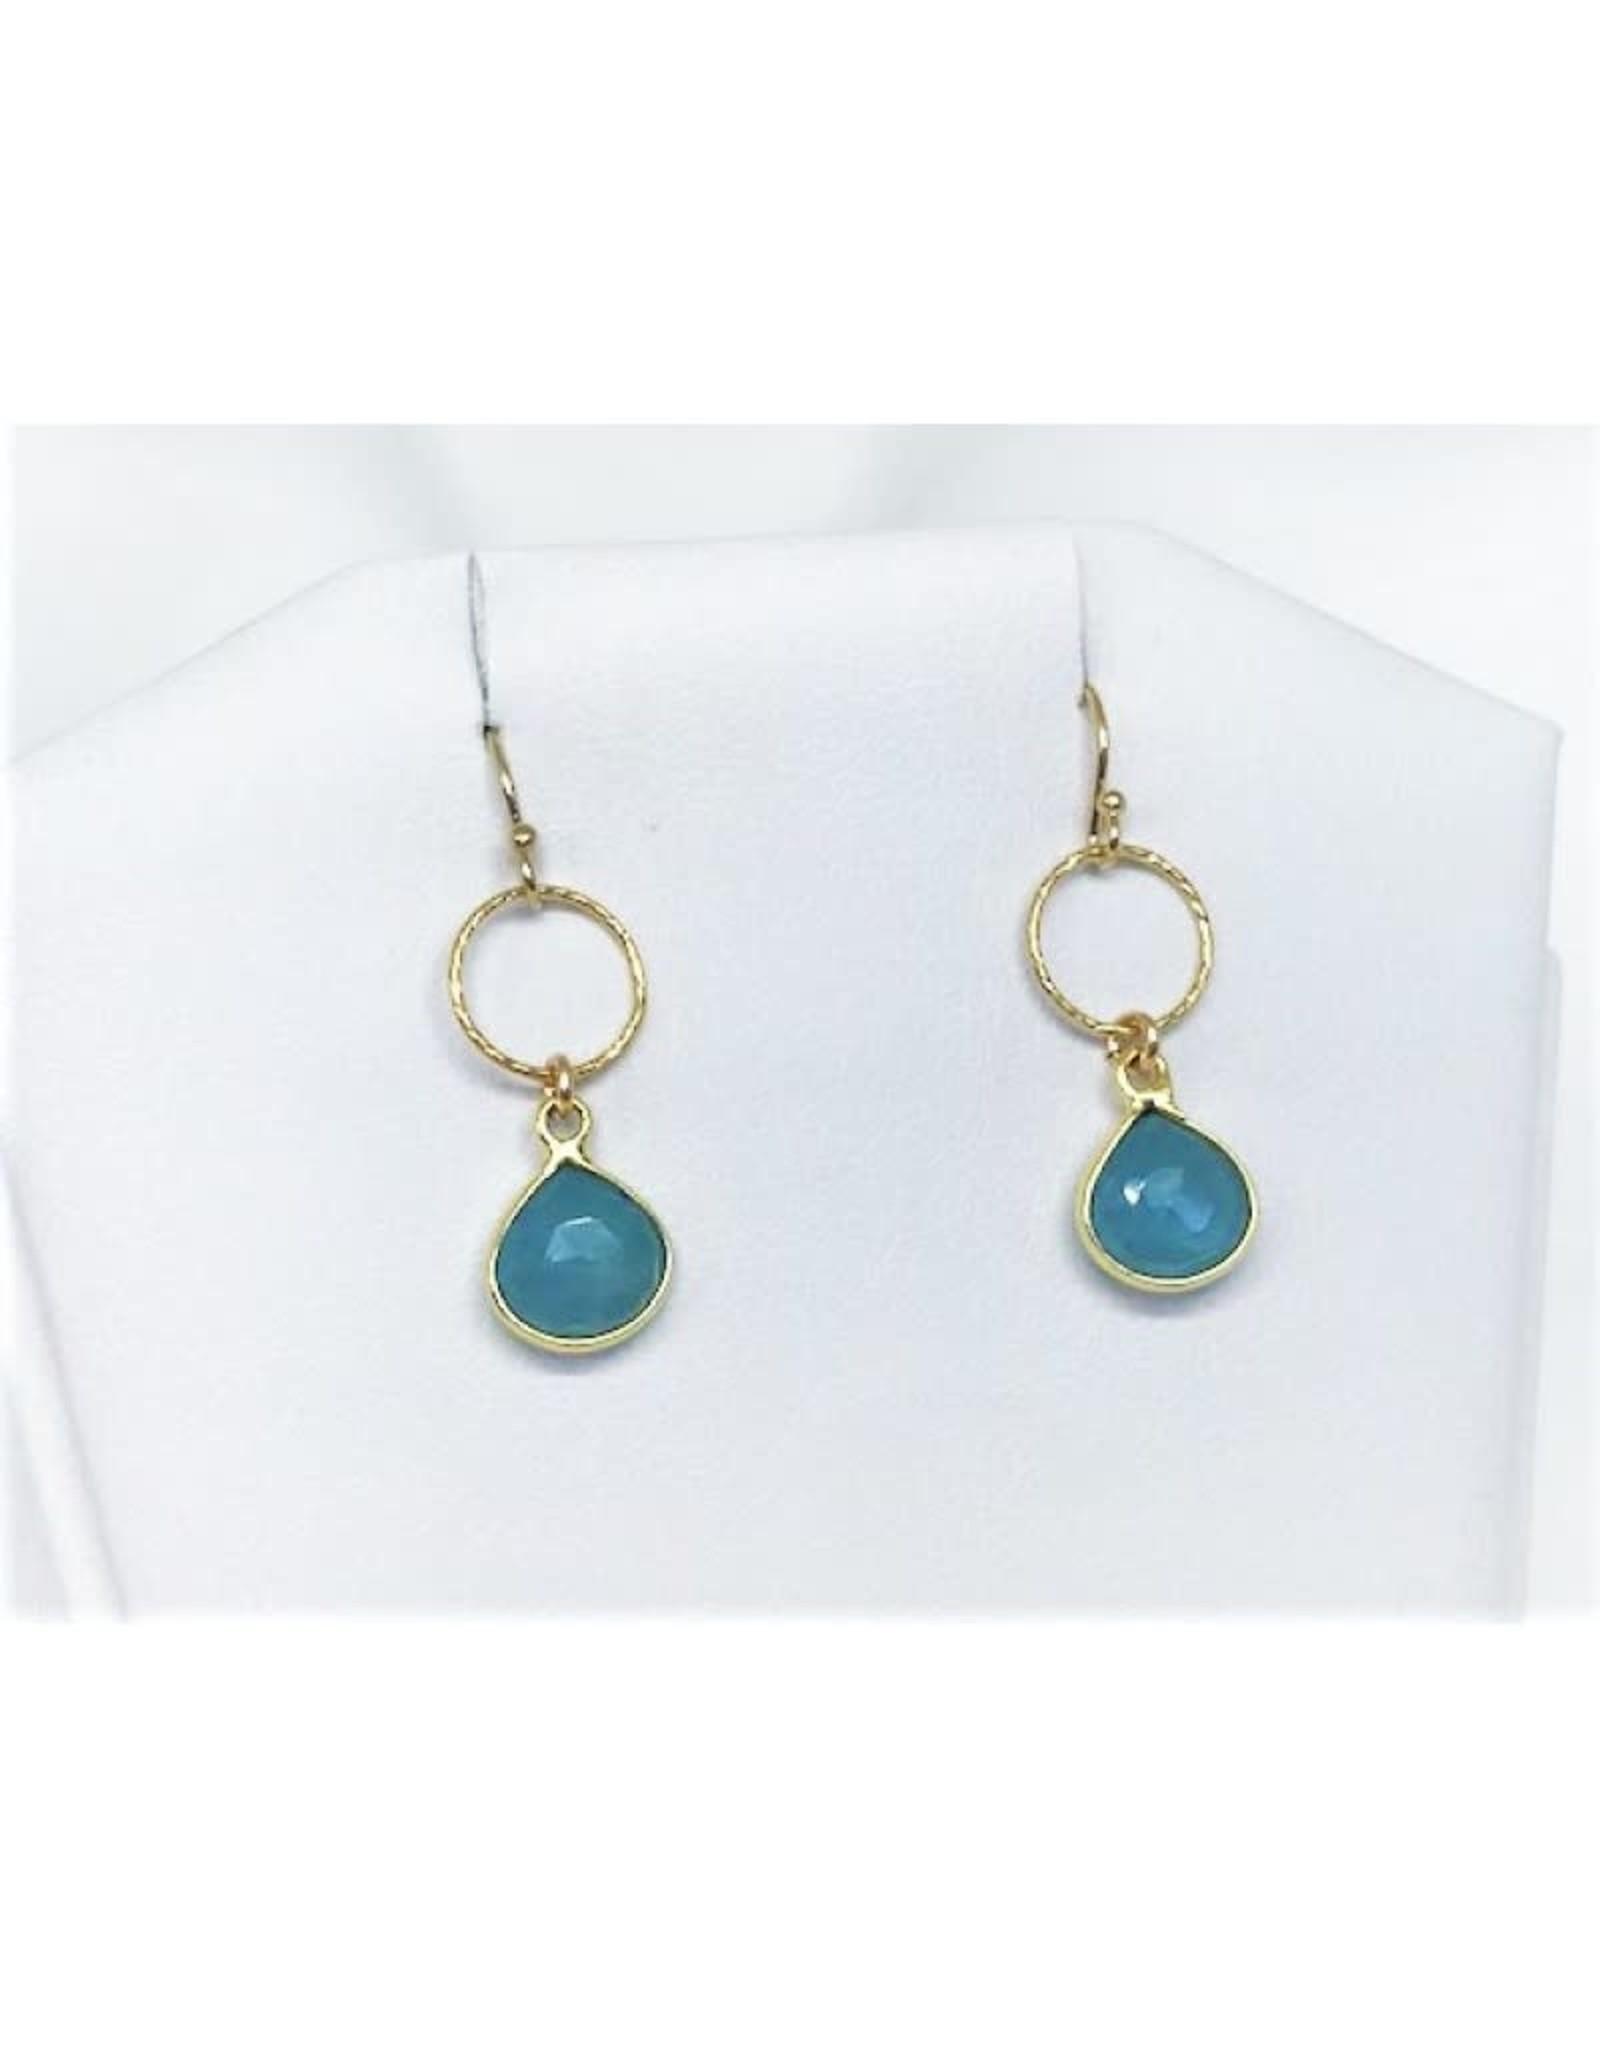 French Hook Earrings - Aquamarine/Gold/Sm Circle